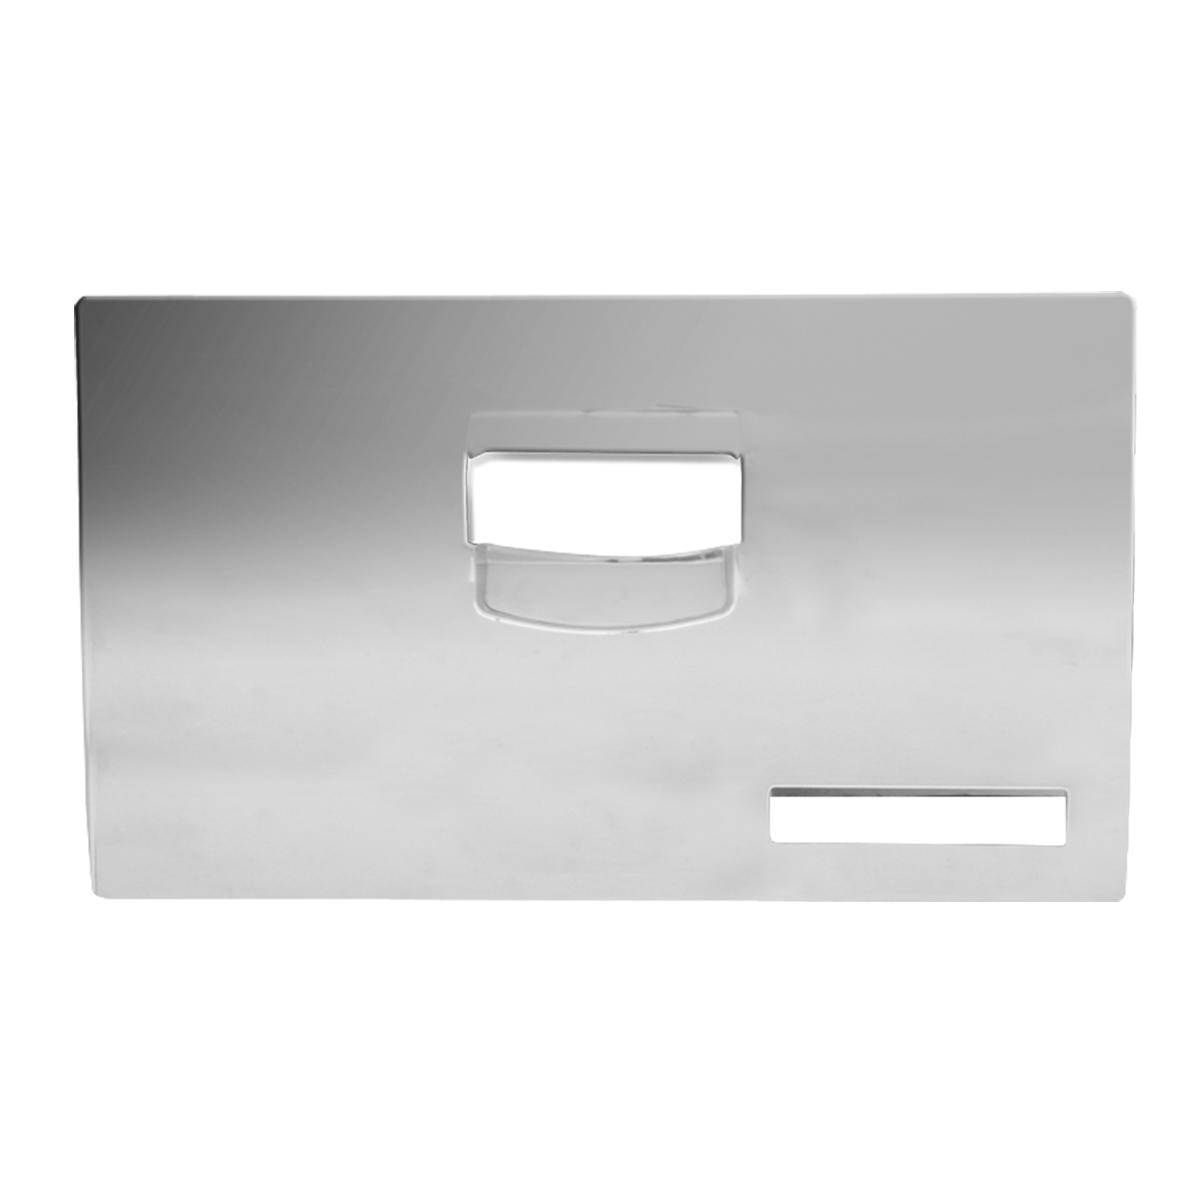 GG Grand General 66992 Chrome Plastic Glove Box Latch Trim for Kenworth 2002-05